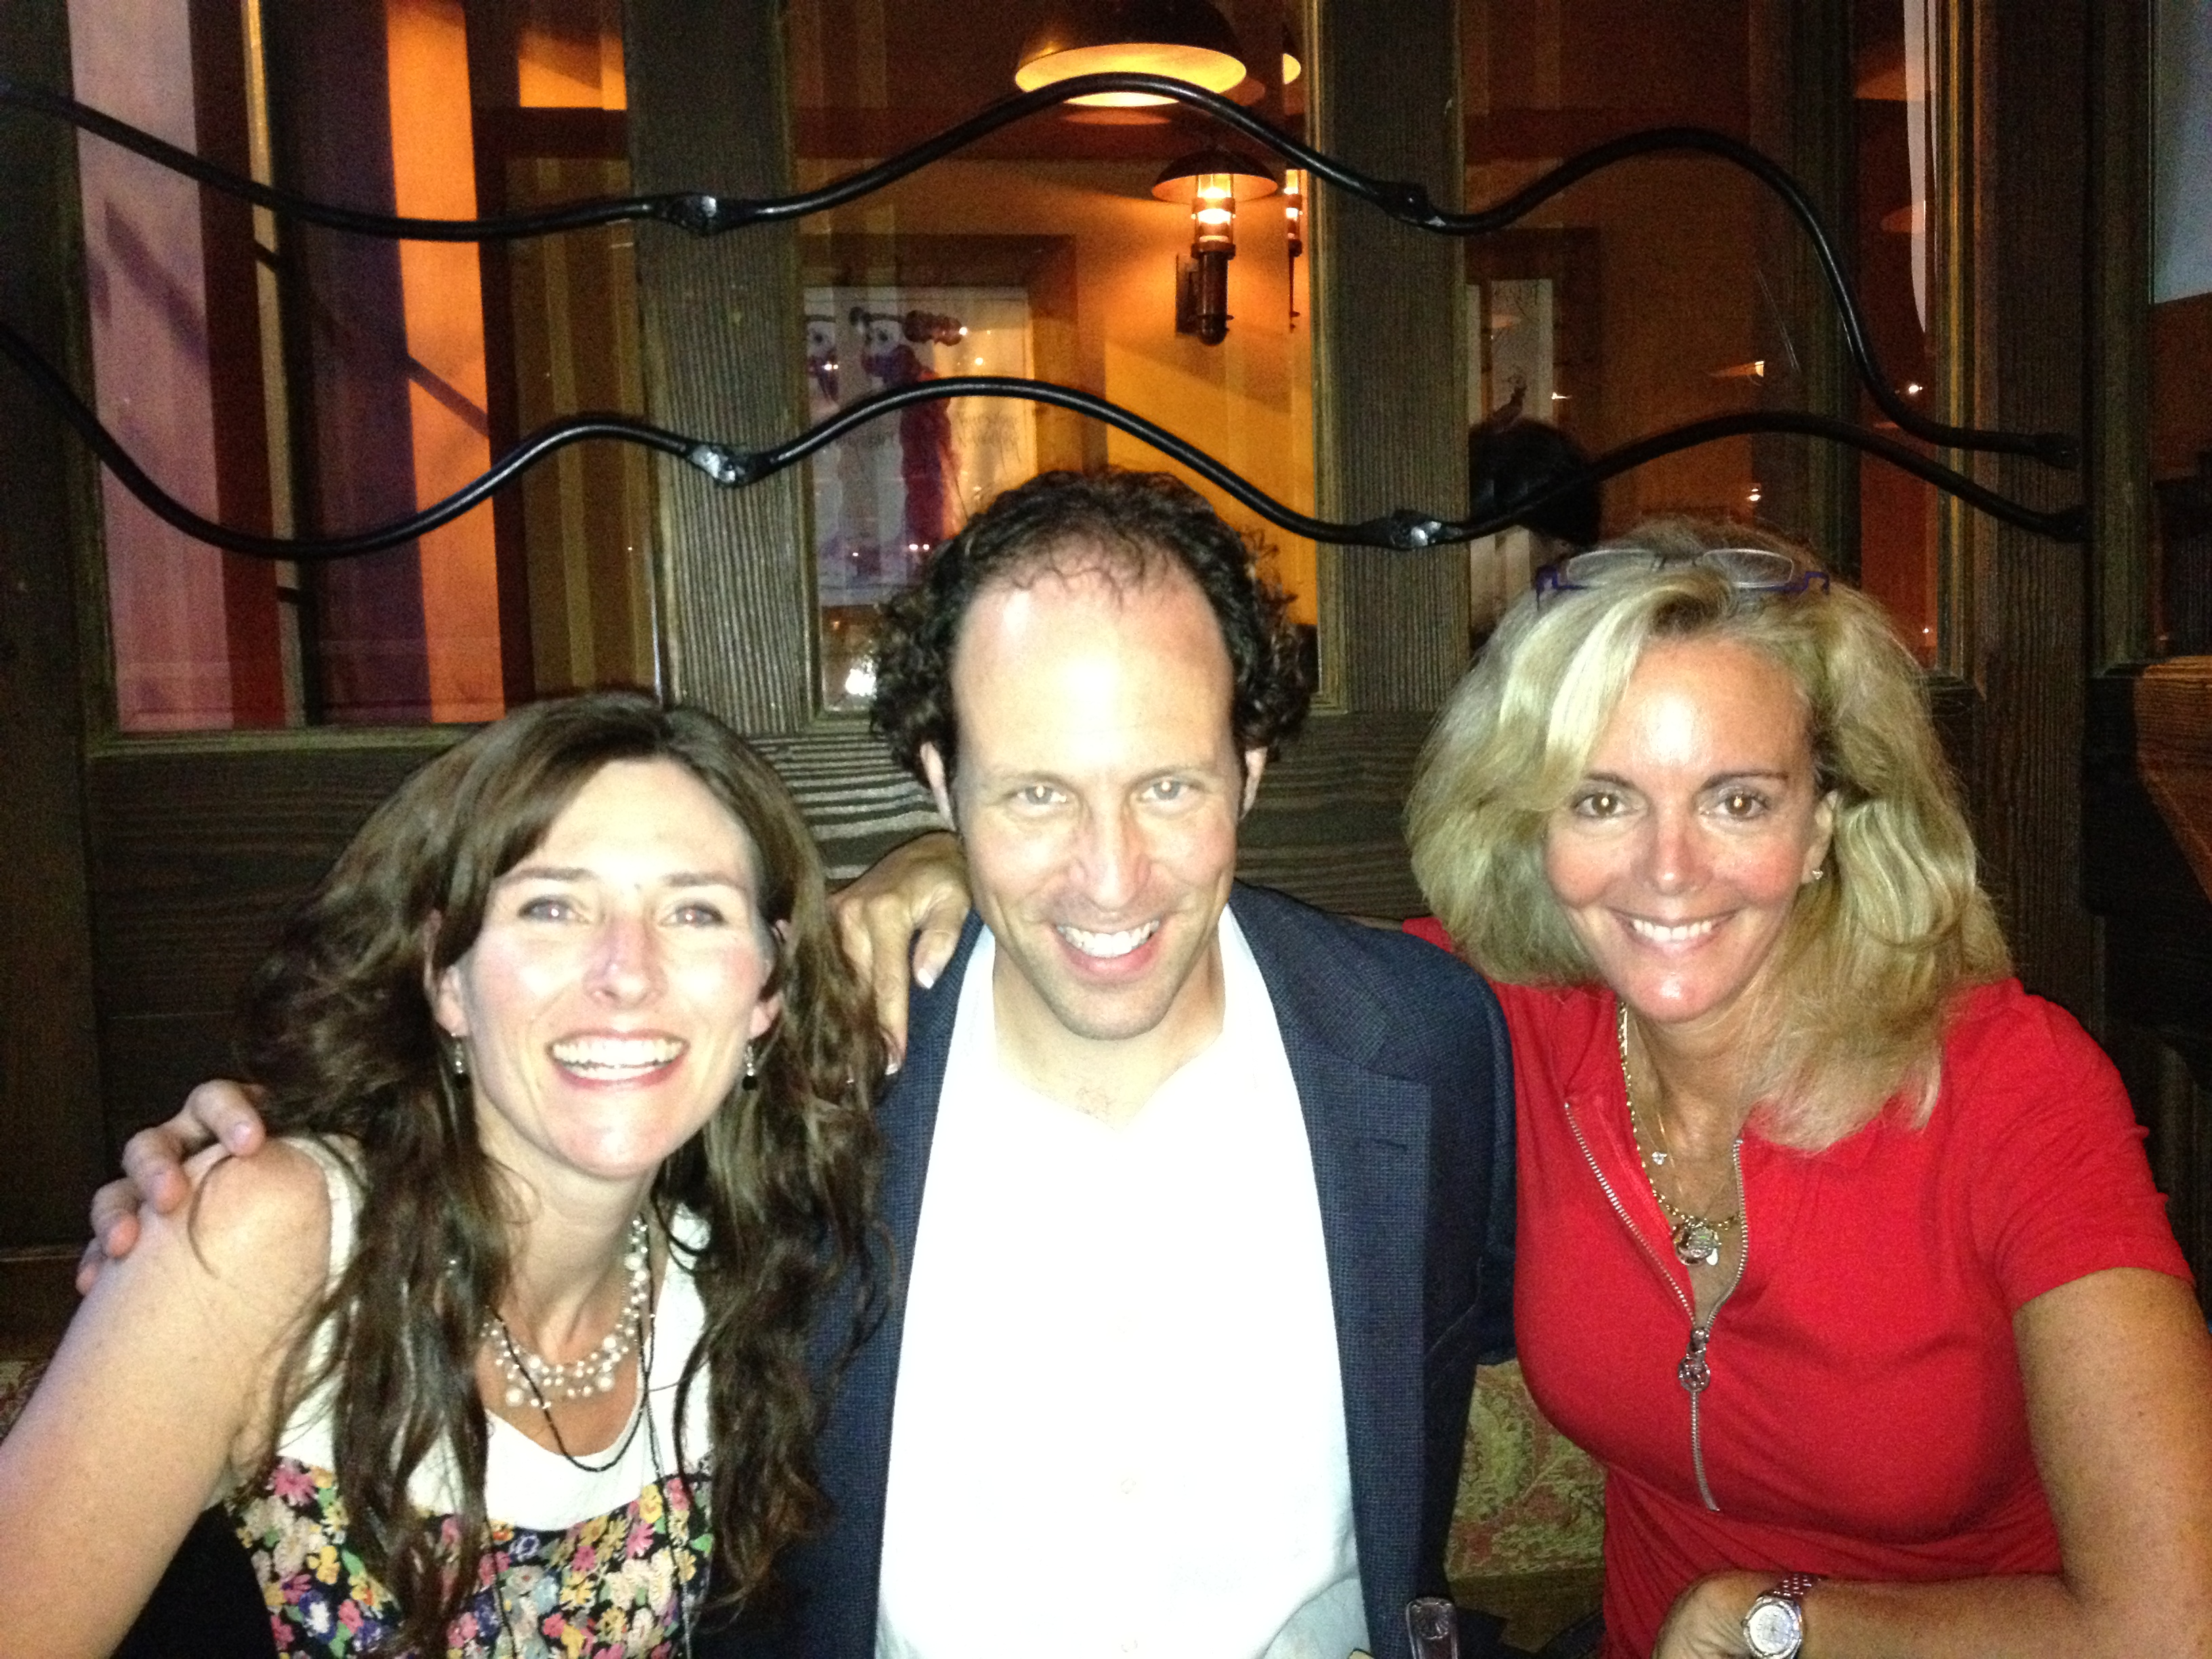 MM, Brad Parks, Deborah Coontz